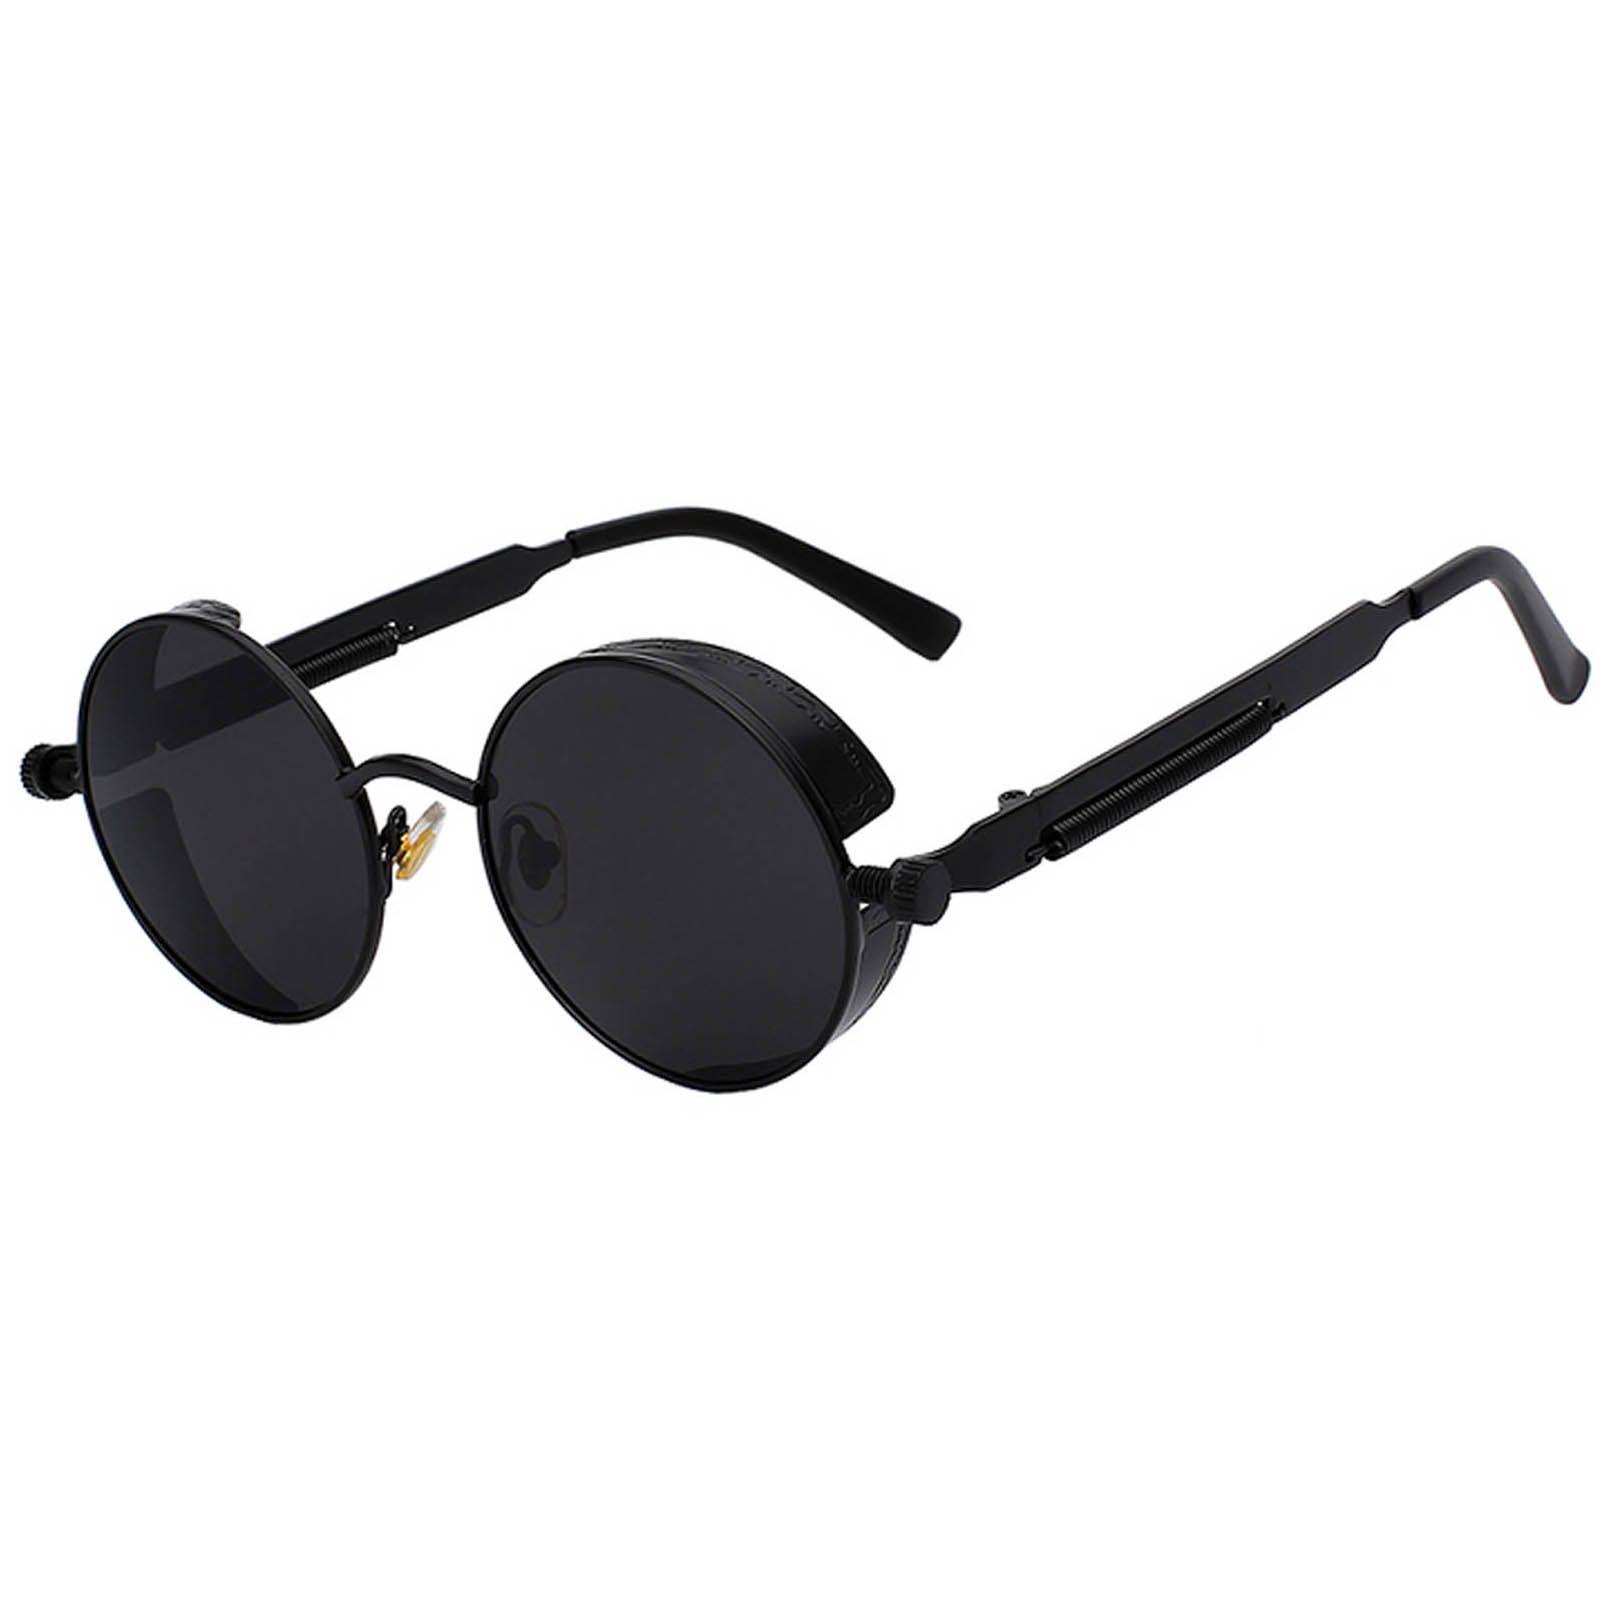 Black Sunglasses Women Shades Sunglassesvintage Sunglassescase Summertimefun Womenover40 Steampunk Sunglasses Circle Sunglasses Vintage Sunglasses Retro